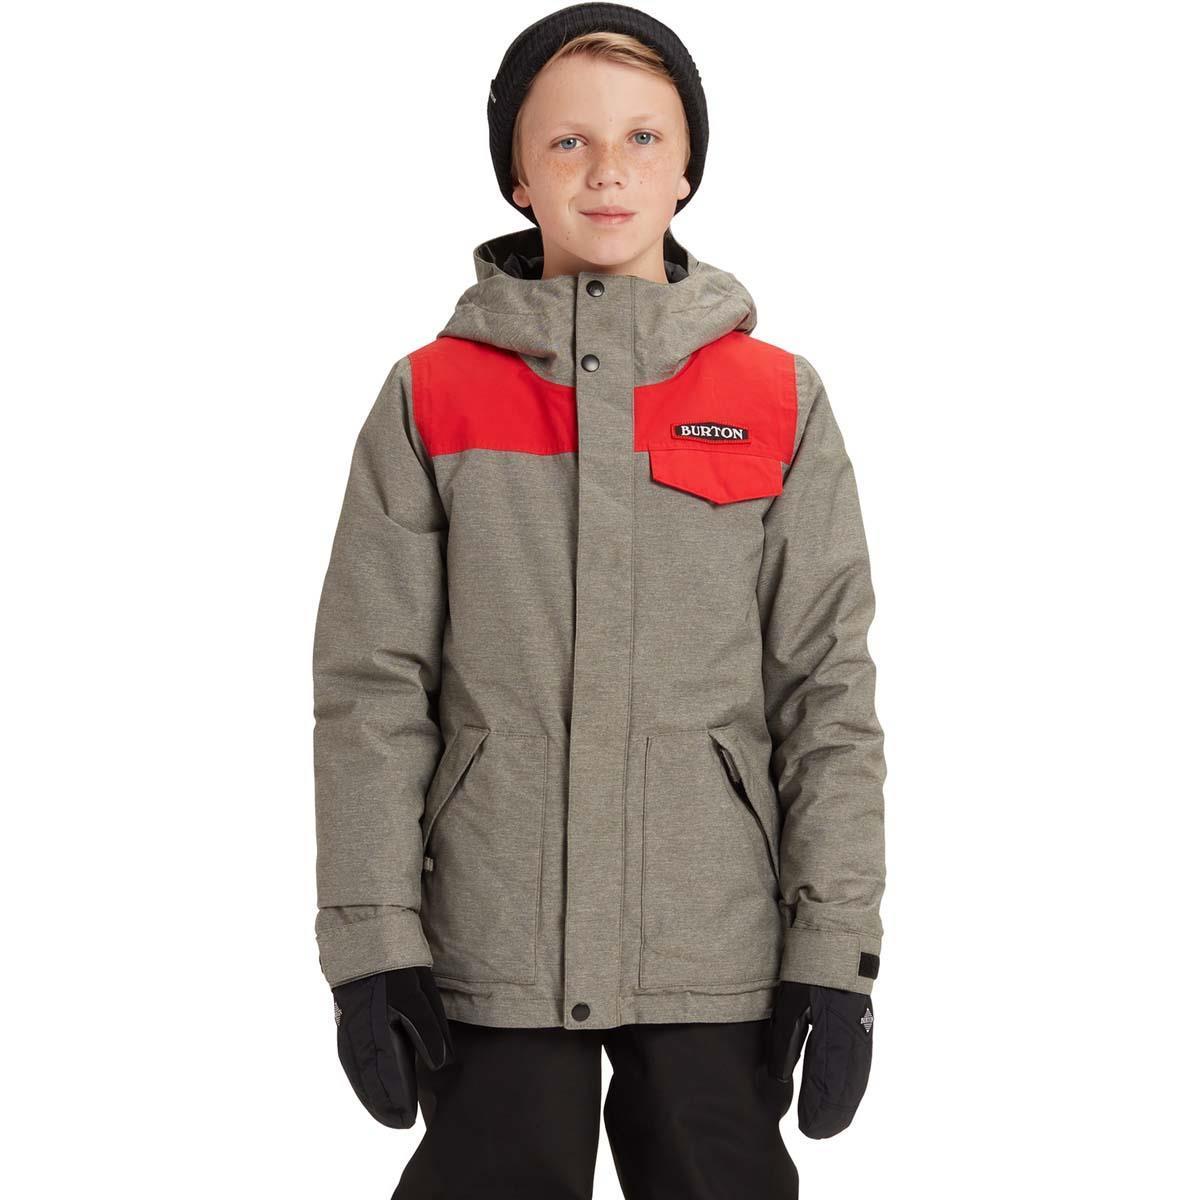 Burton Dugout Jacket Boy's